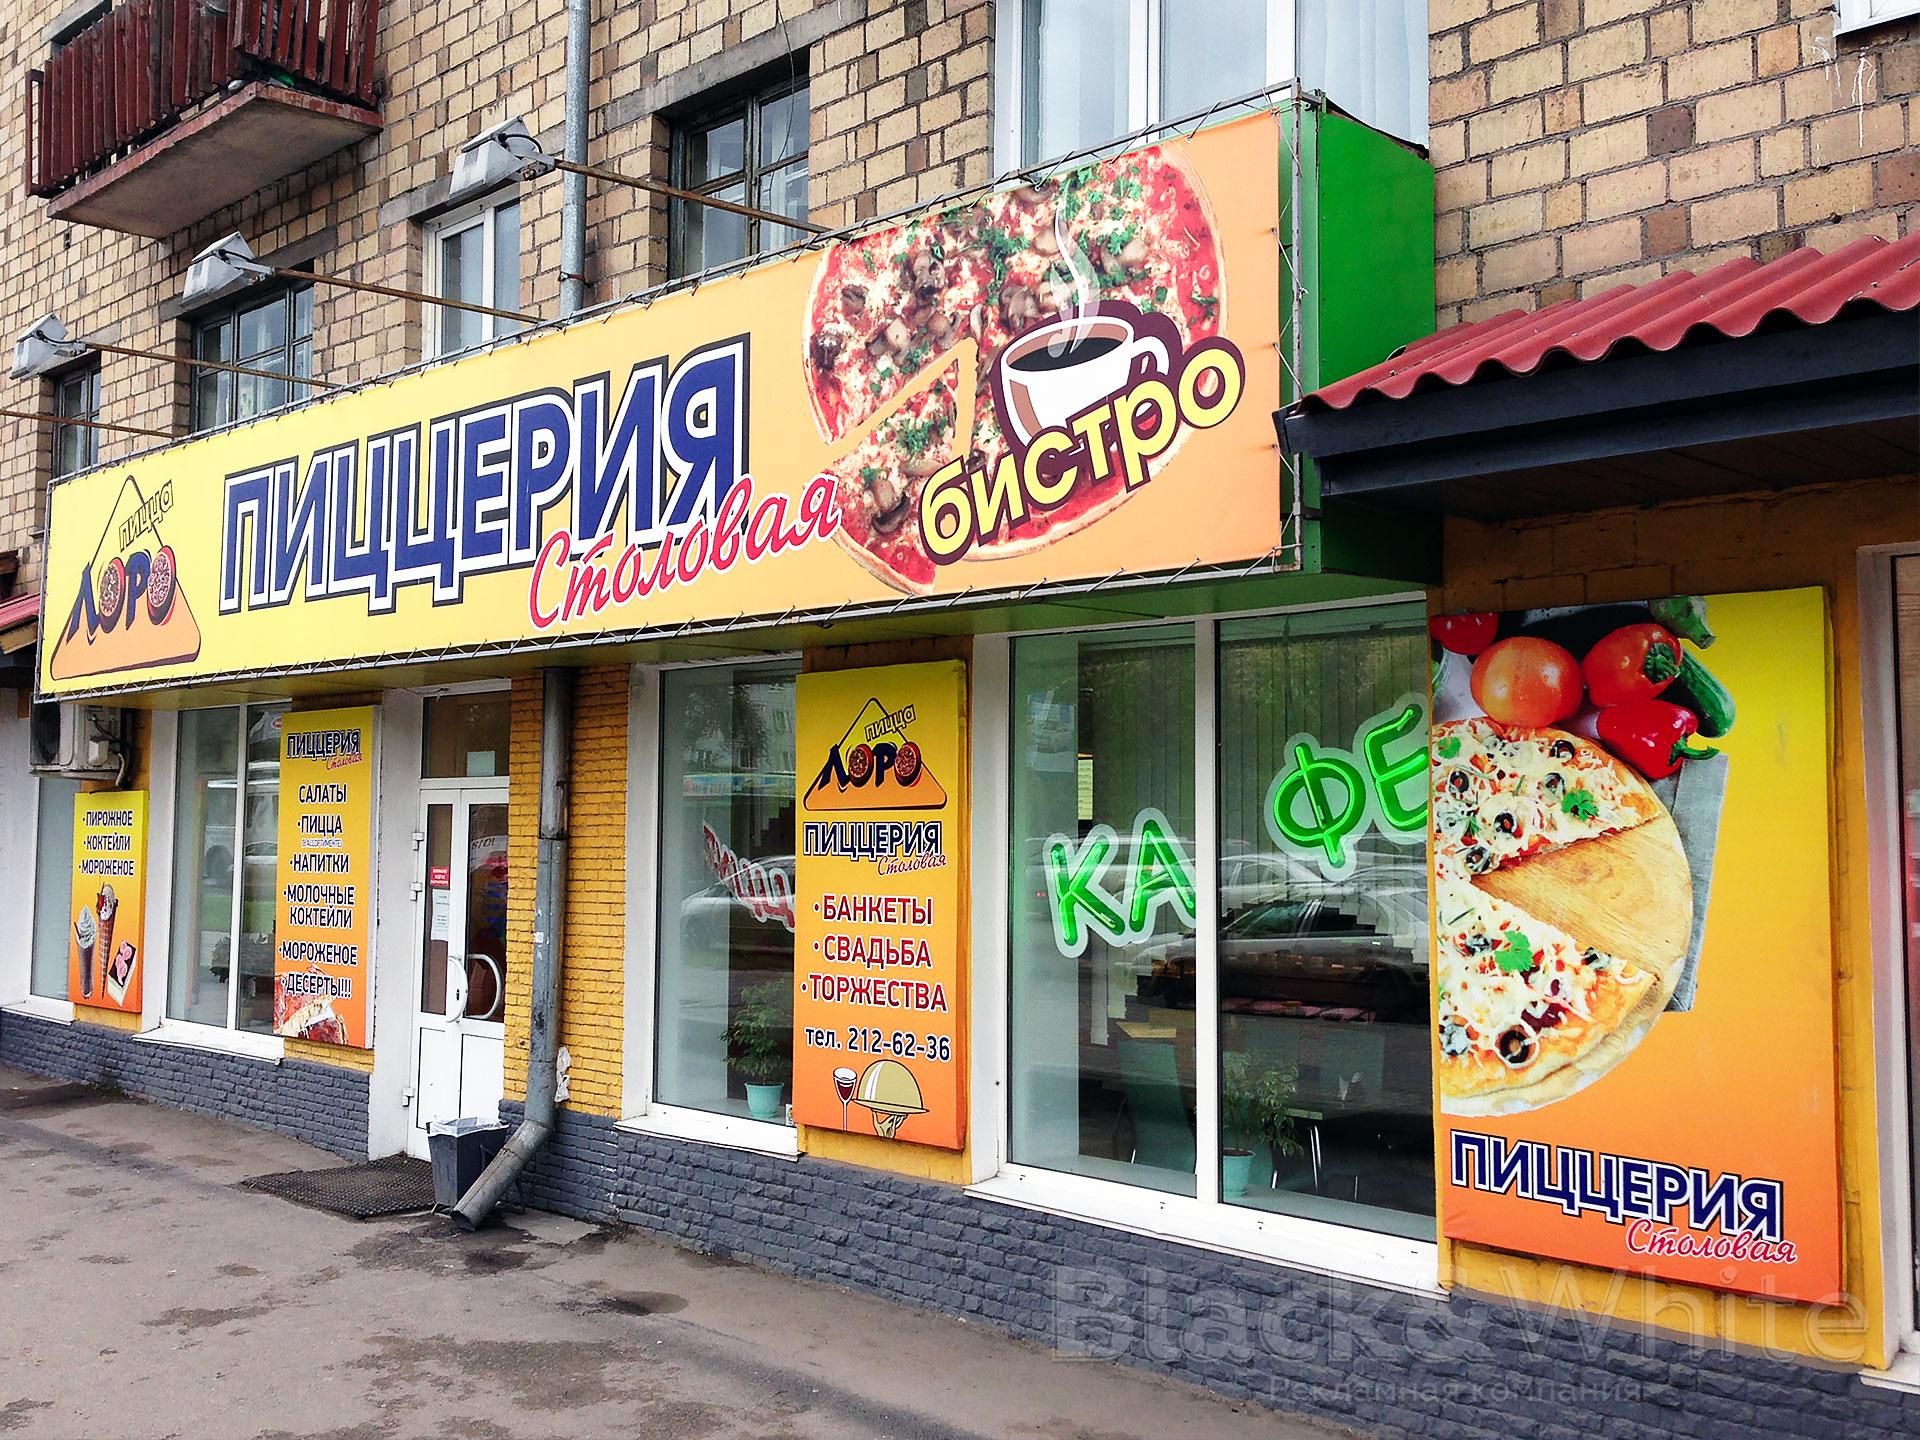 Печать-на-баннере-в-Красноярске-BW...jpg